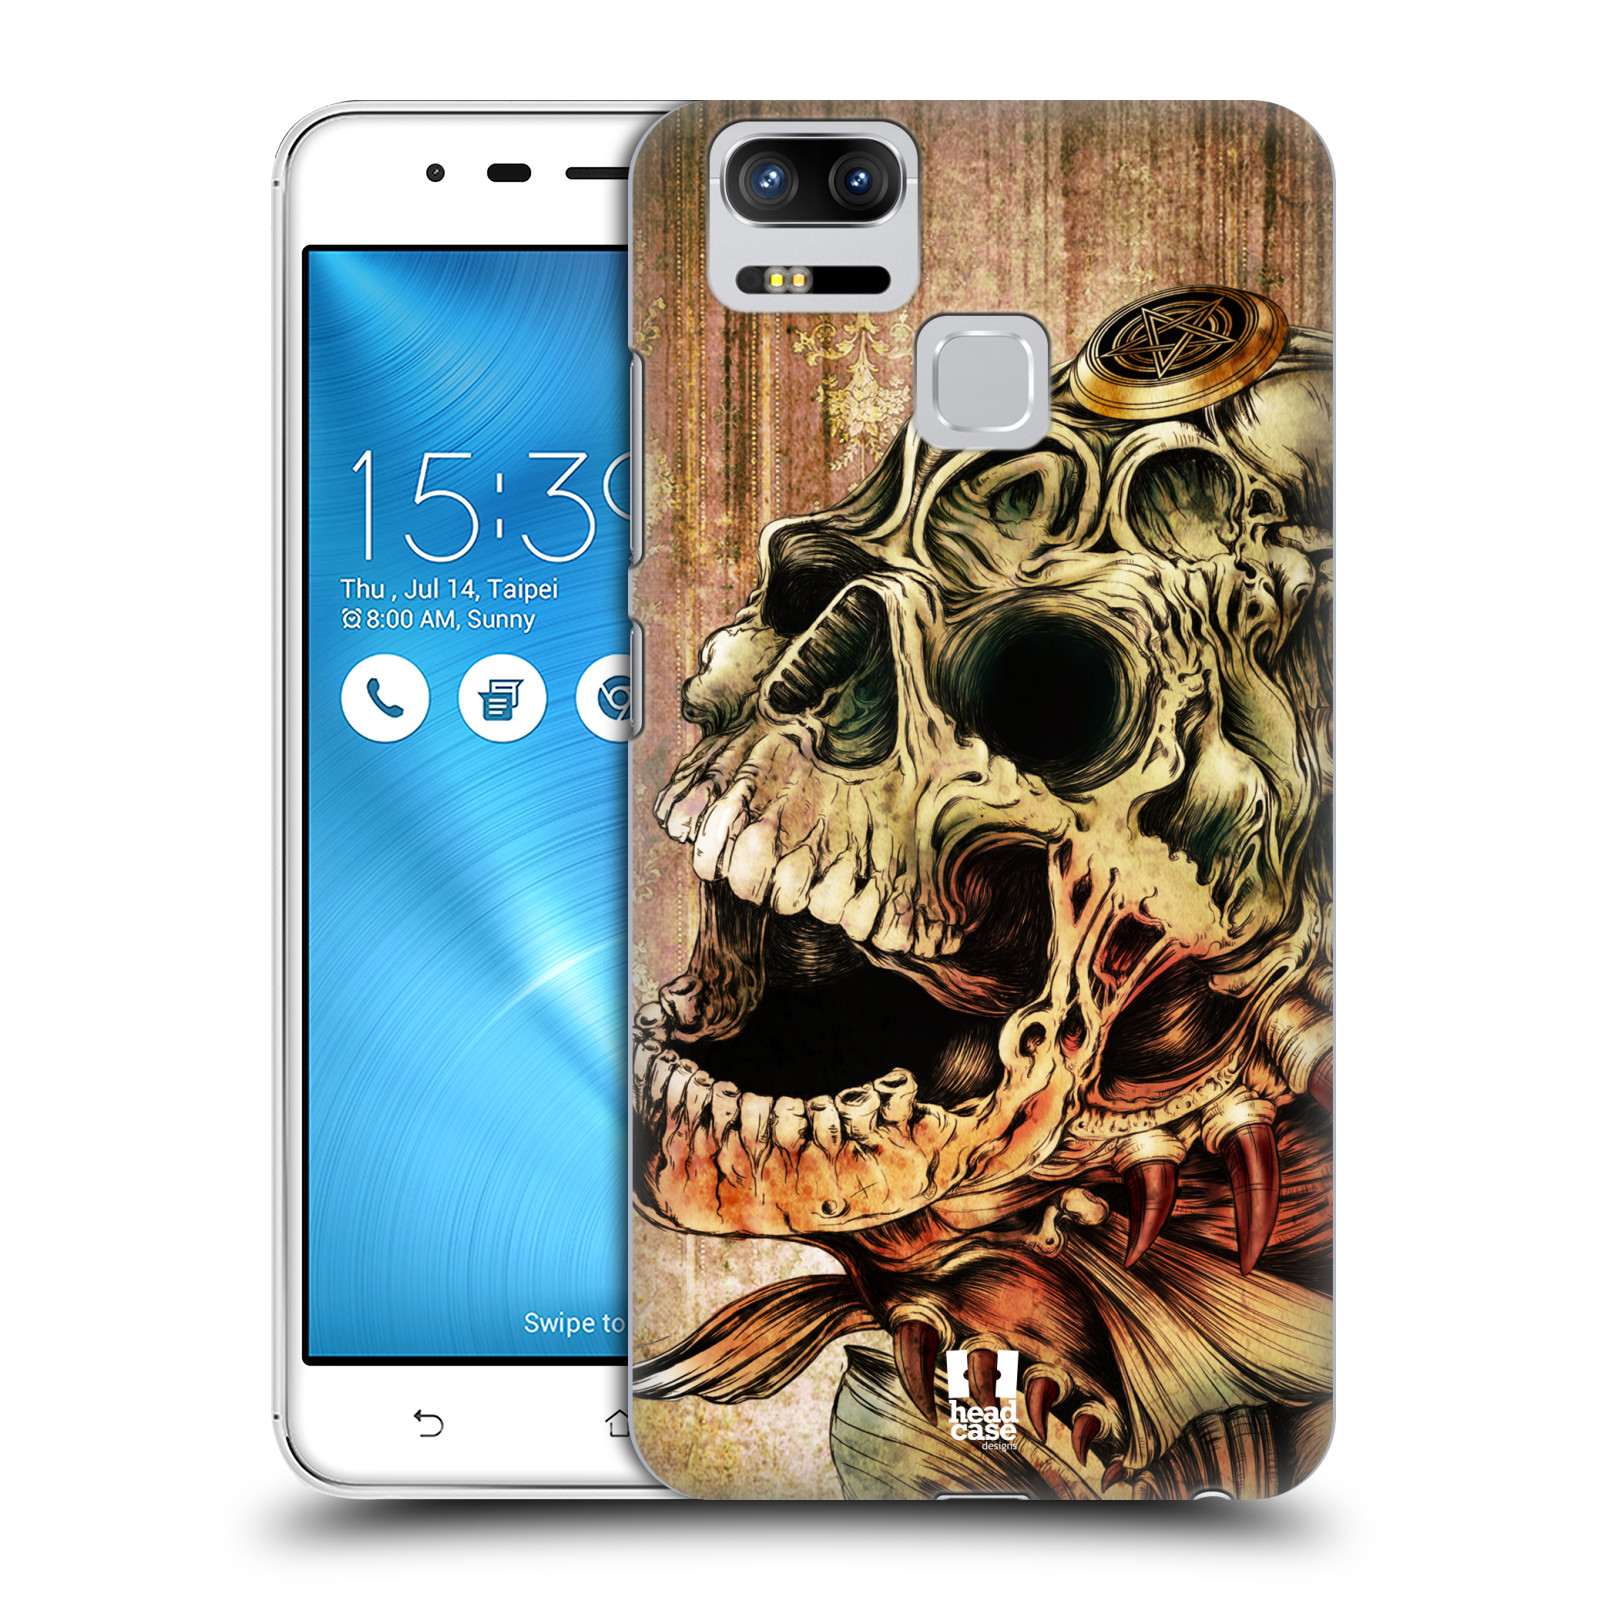 Plastové pouzdro na mobil Asus ZenFone 3 ZOOM ZE553KL - Head Case - PIRANHA (Plastový kryt či obal na mobilní telefon Asus ZenFone 3 ZOOM ZE553KL s motivem PIRANHA)